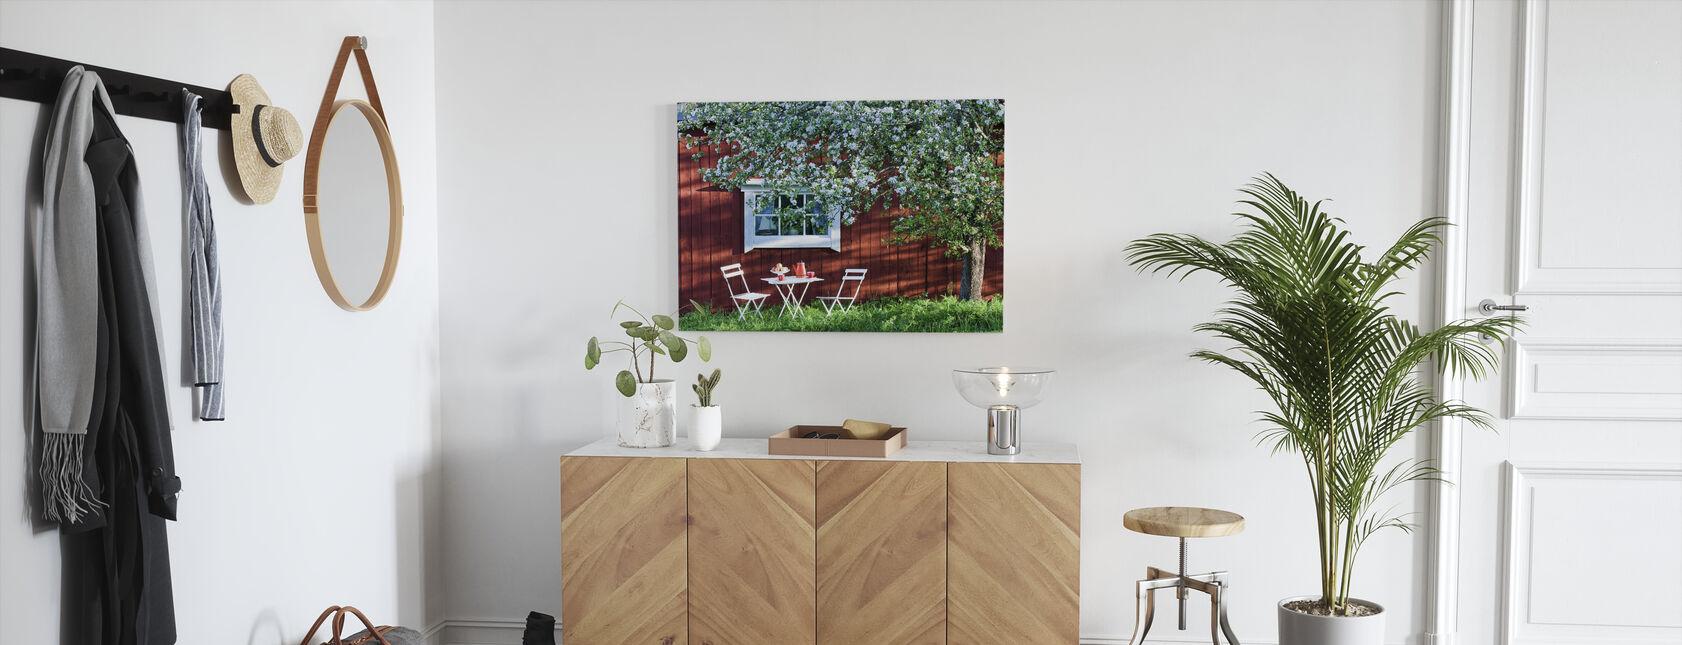 Garden Holiday - Canvas print - Hallway